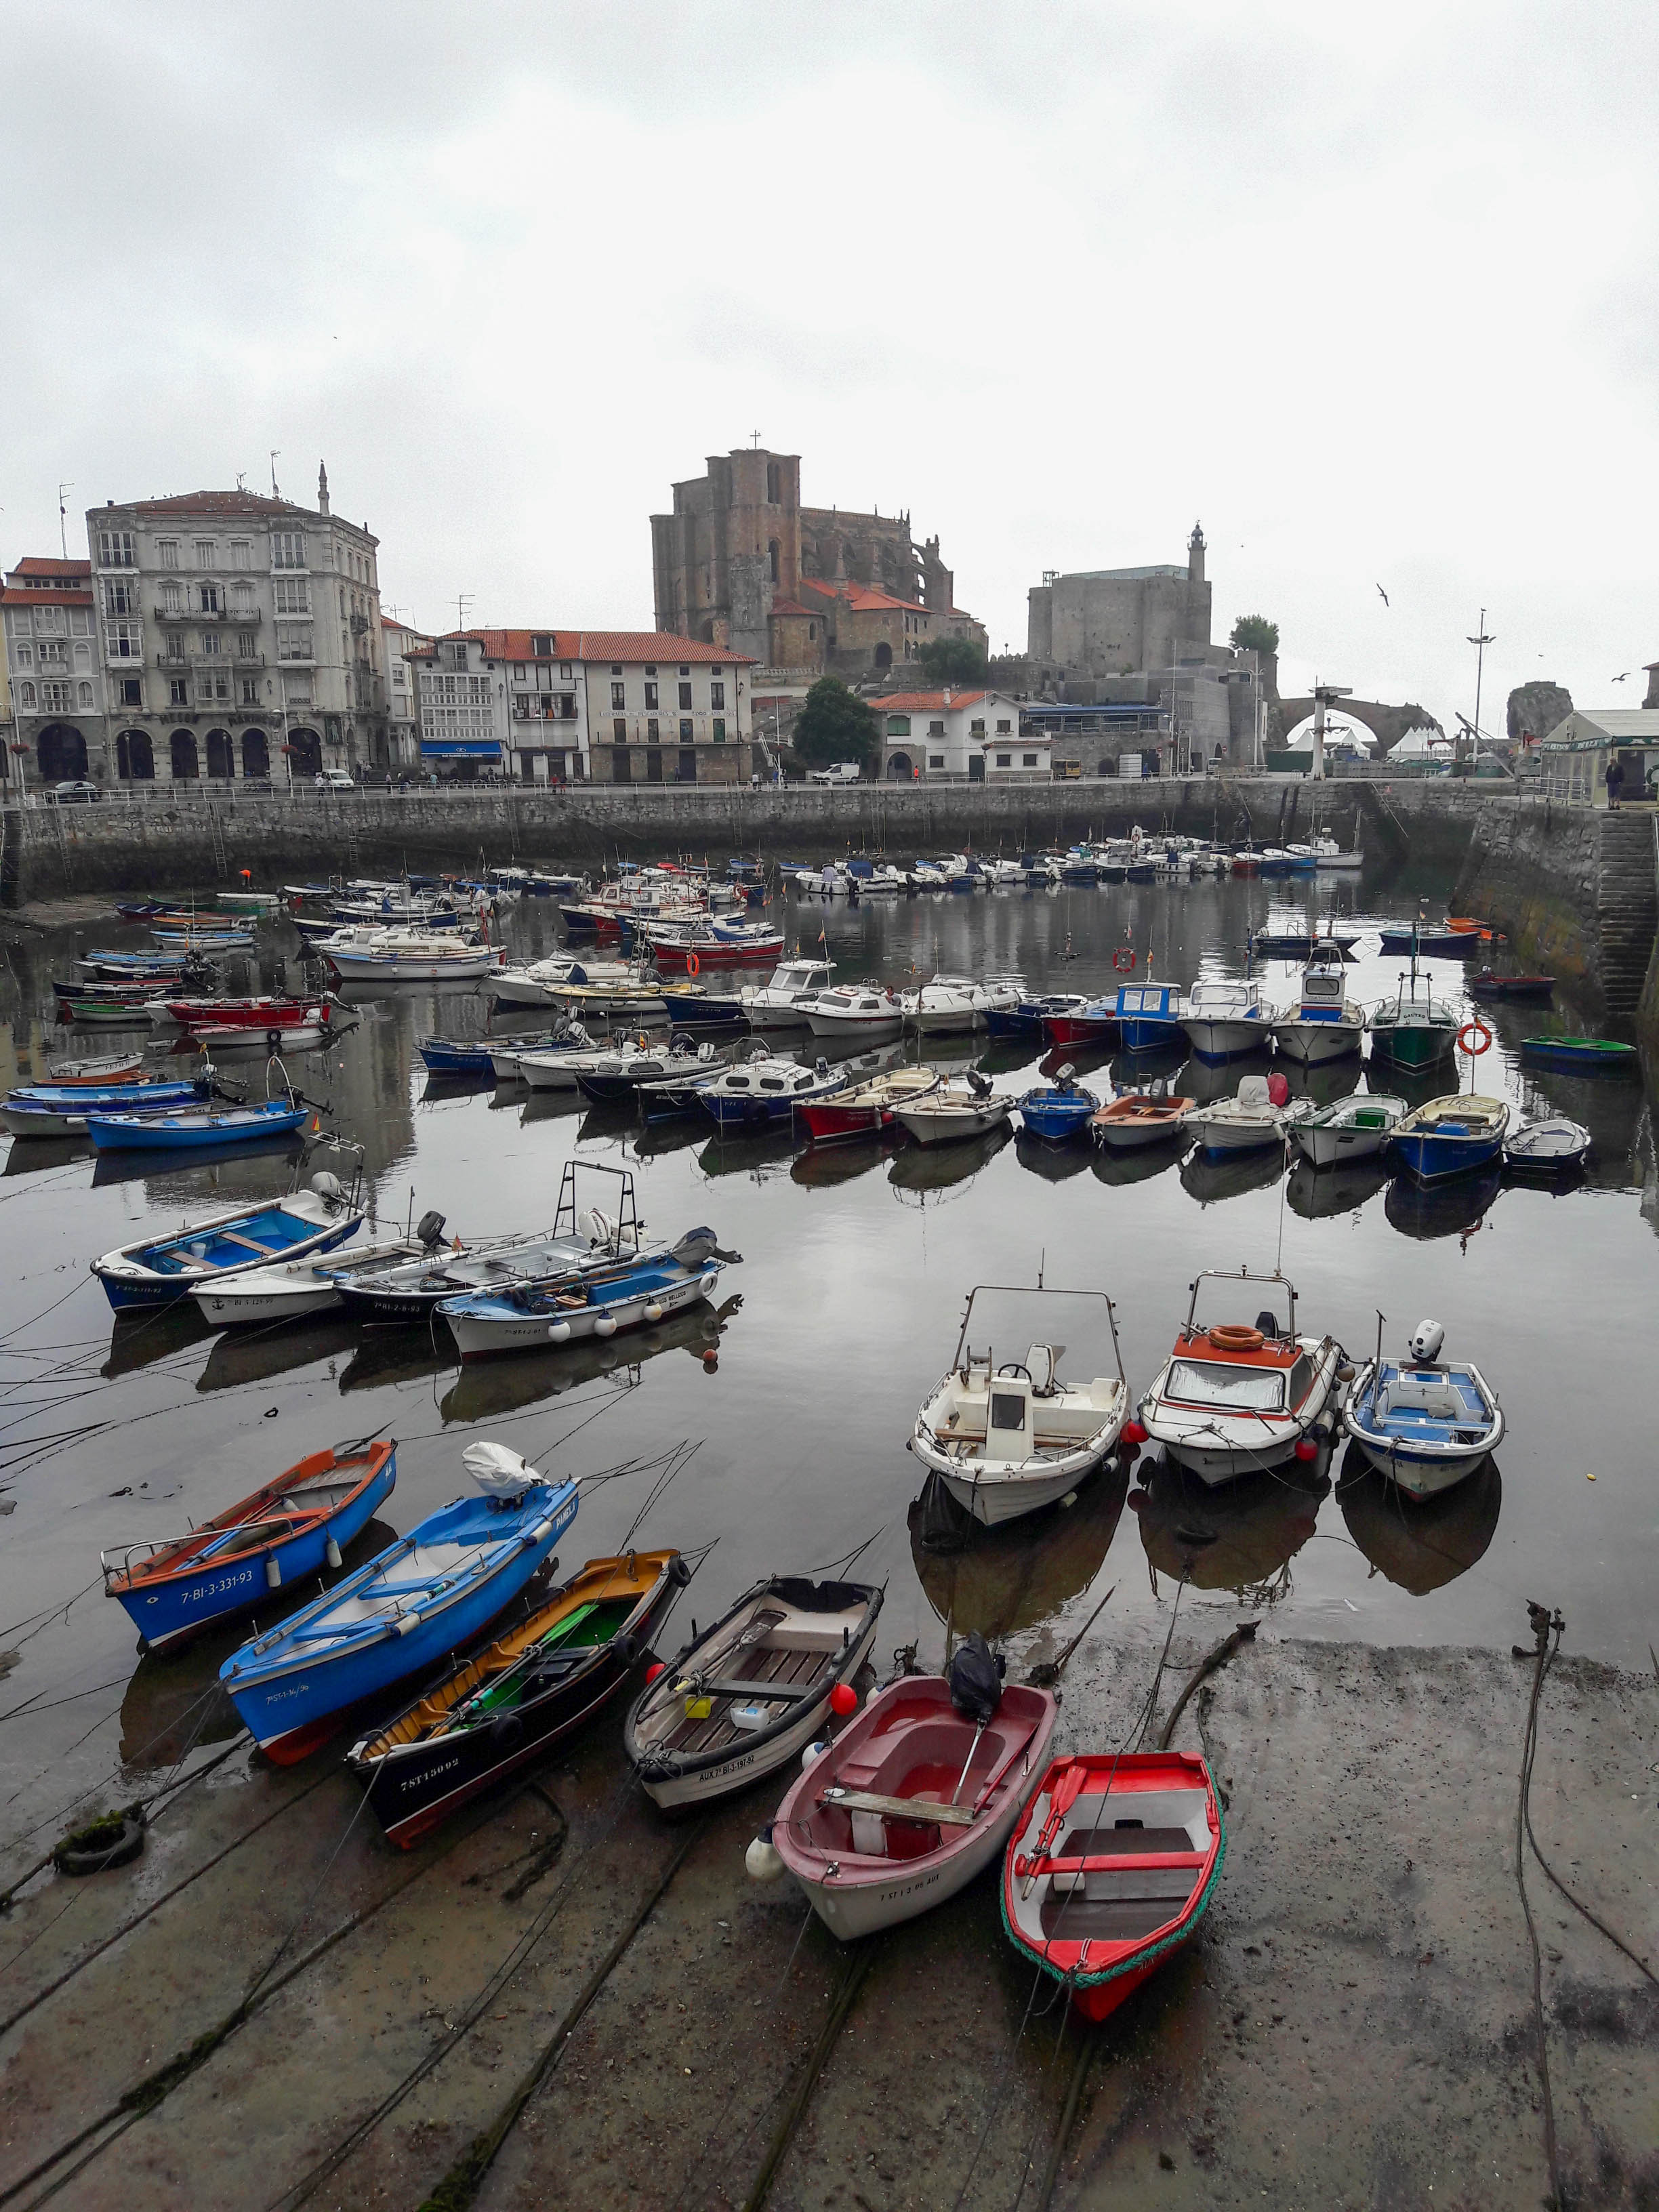 Castro-Urdiales, Cantabria